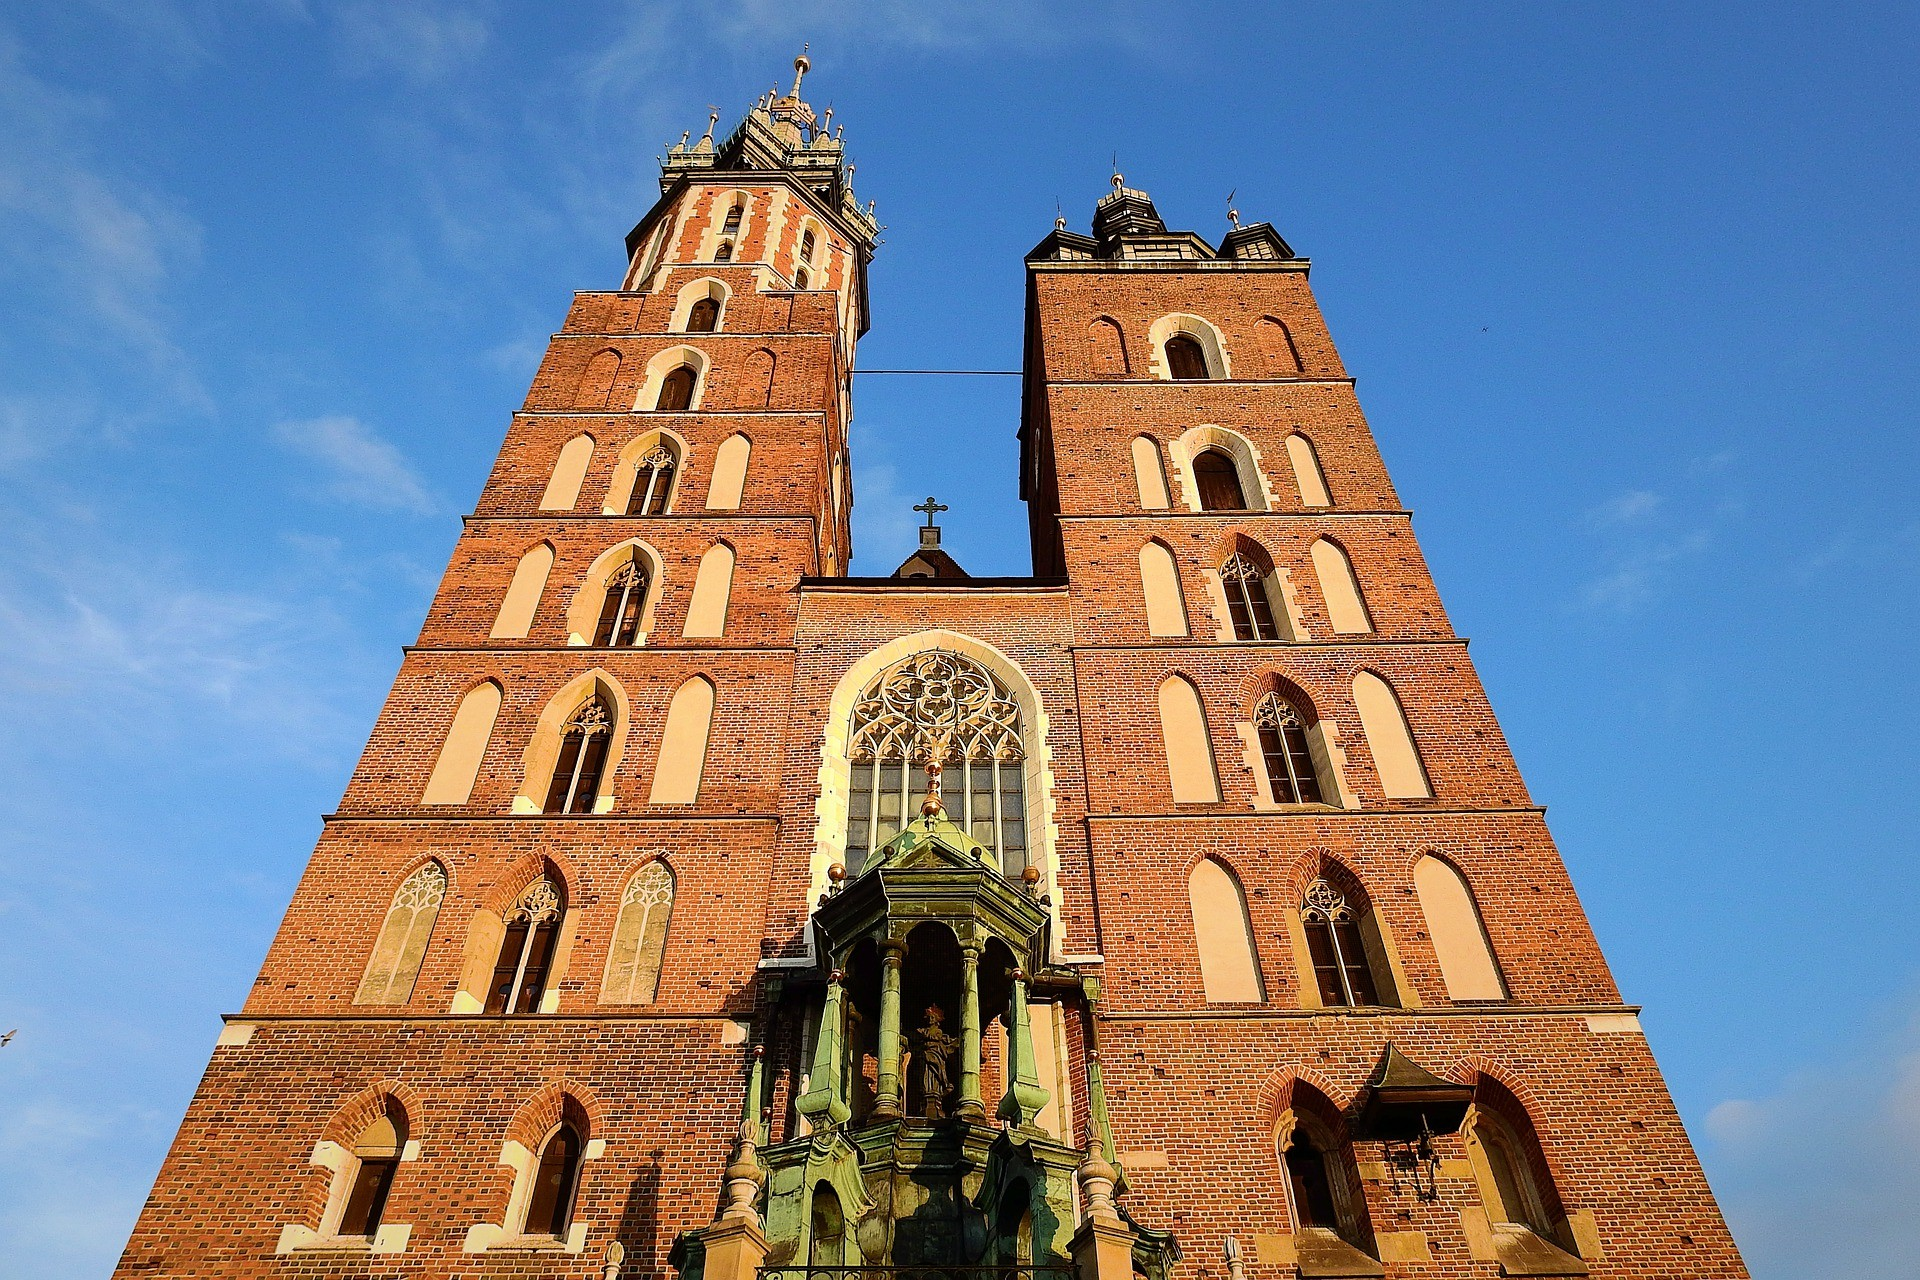 Chiesa di Santa Maria, Cracovia - Foto di Erwin Nowak